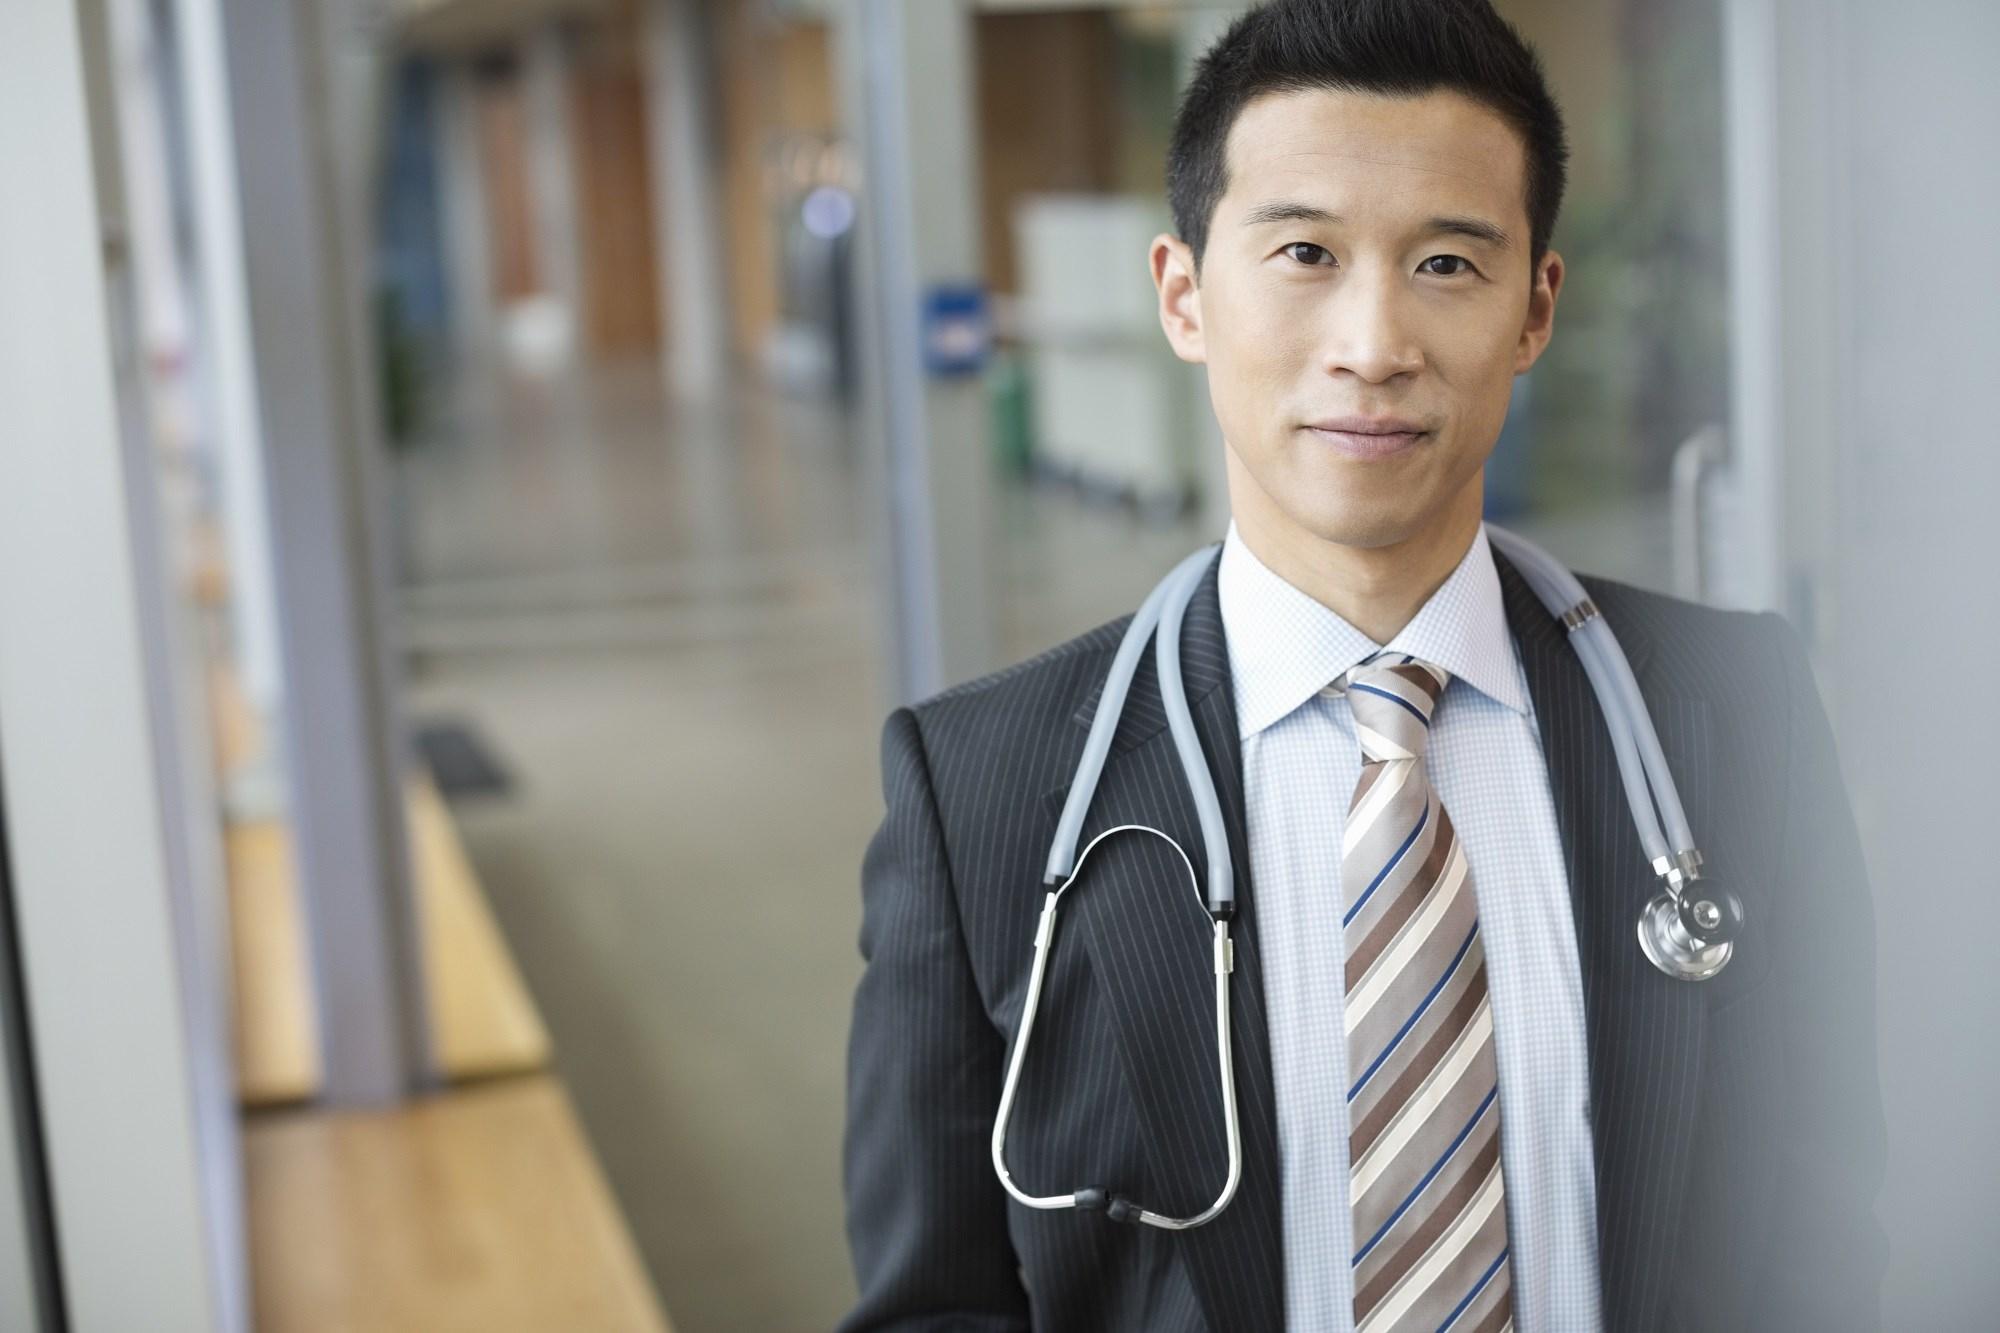 Patients Care About the Clothes Doctors Wear